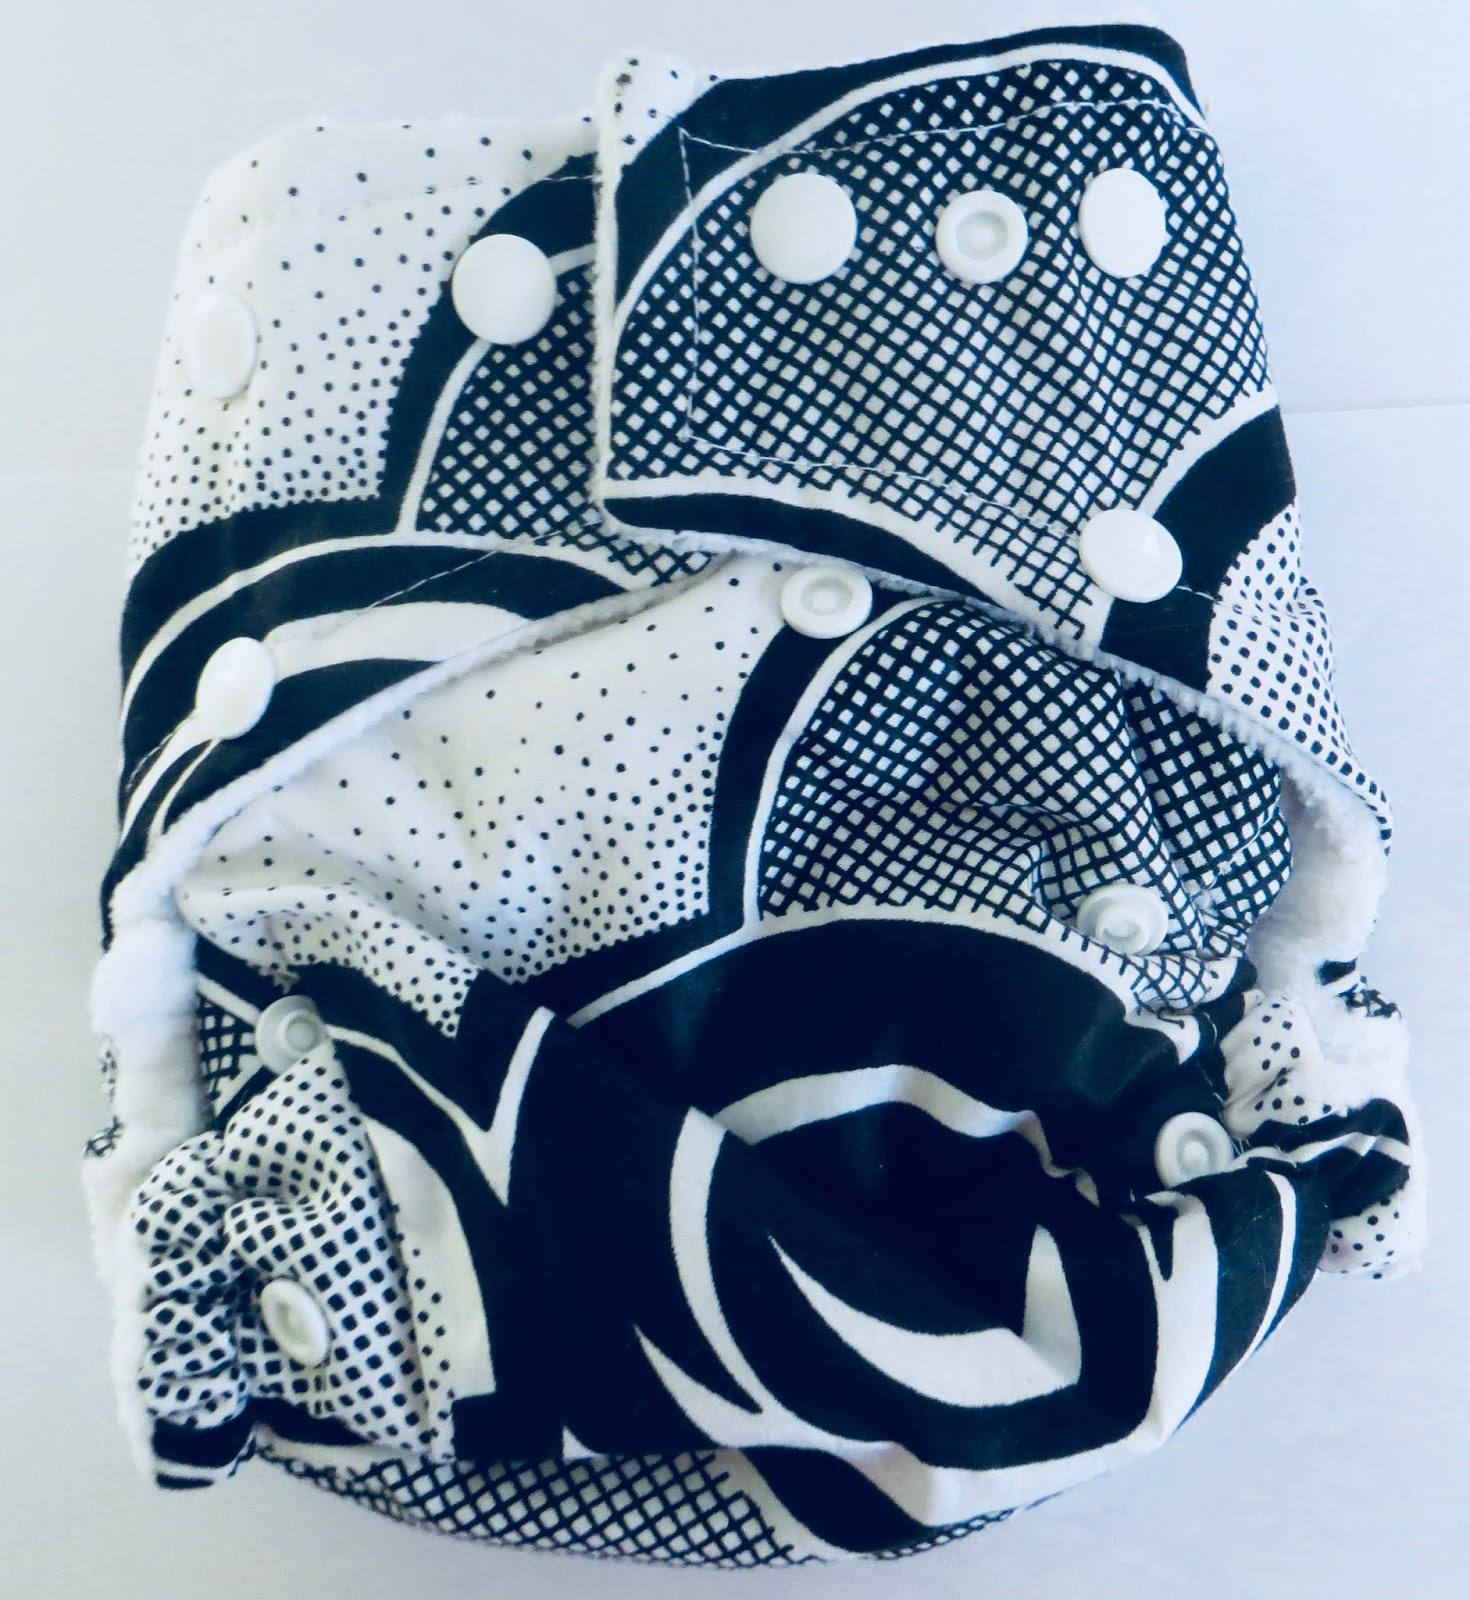 Suah Black & White Cover